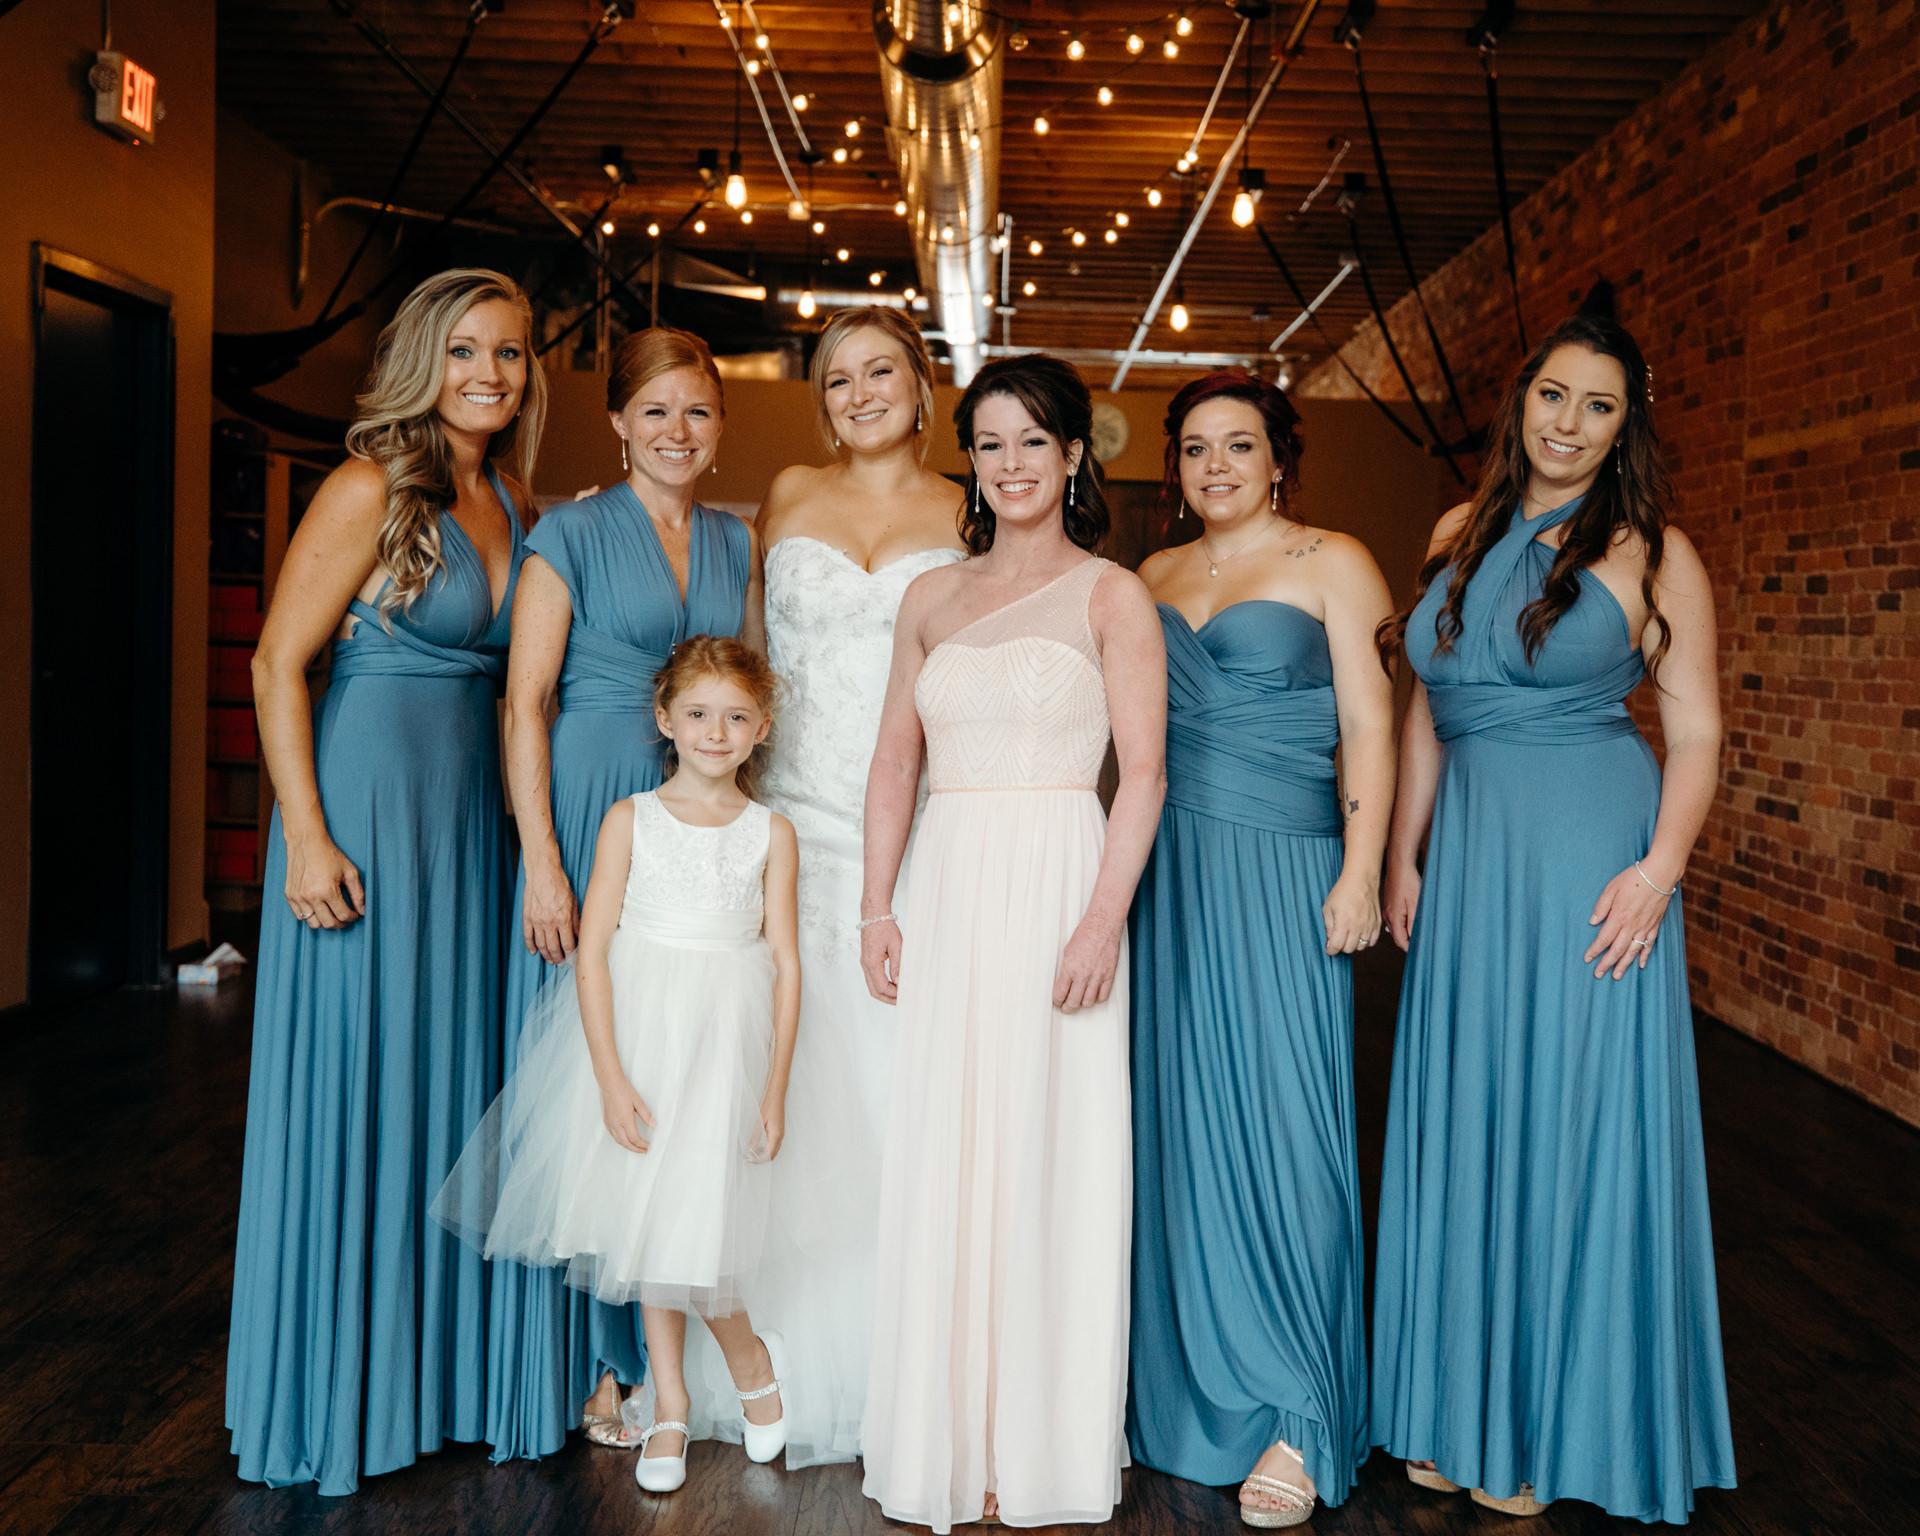 Grant Beachy Weddings photography elkhart south bend goshen warsaw-015.jpg